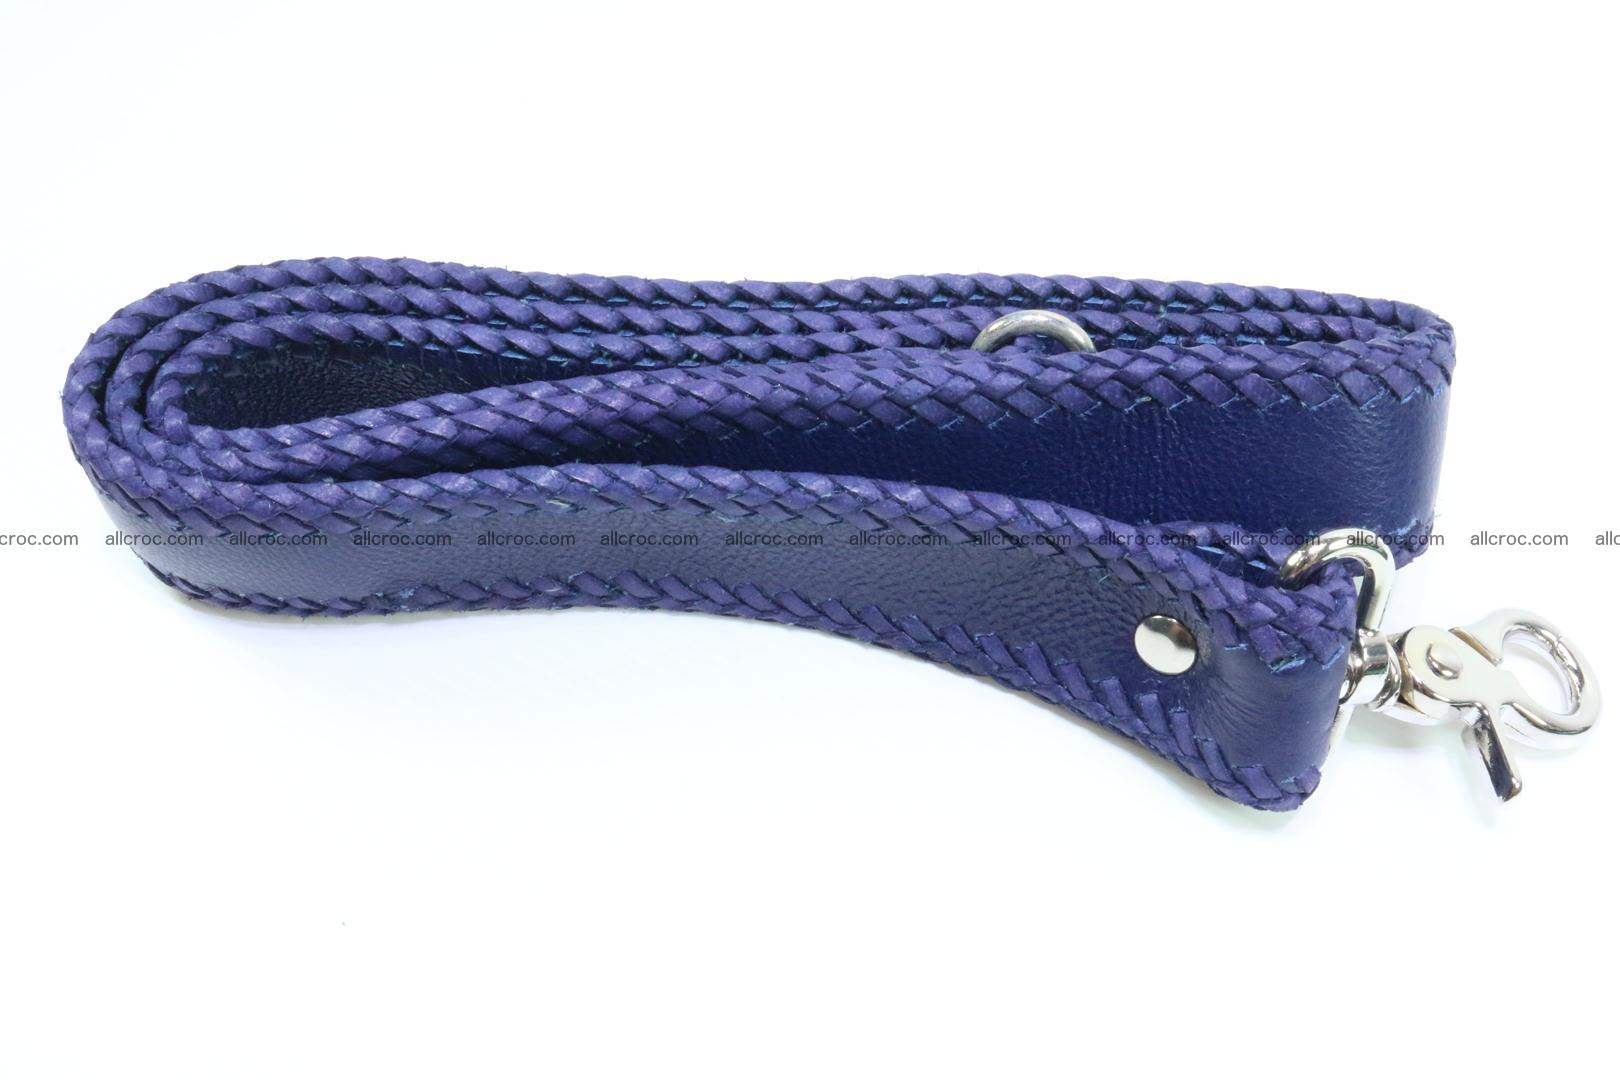 Crocodile skin messenger bag braided edges 419 Foto 12